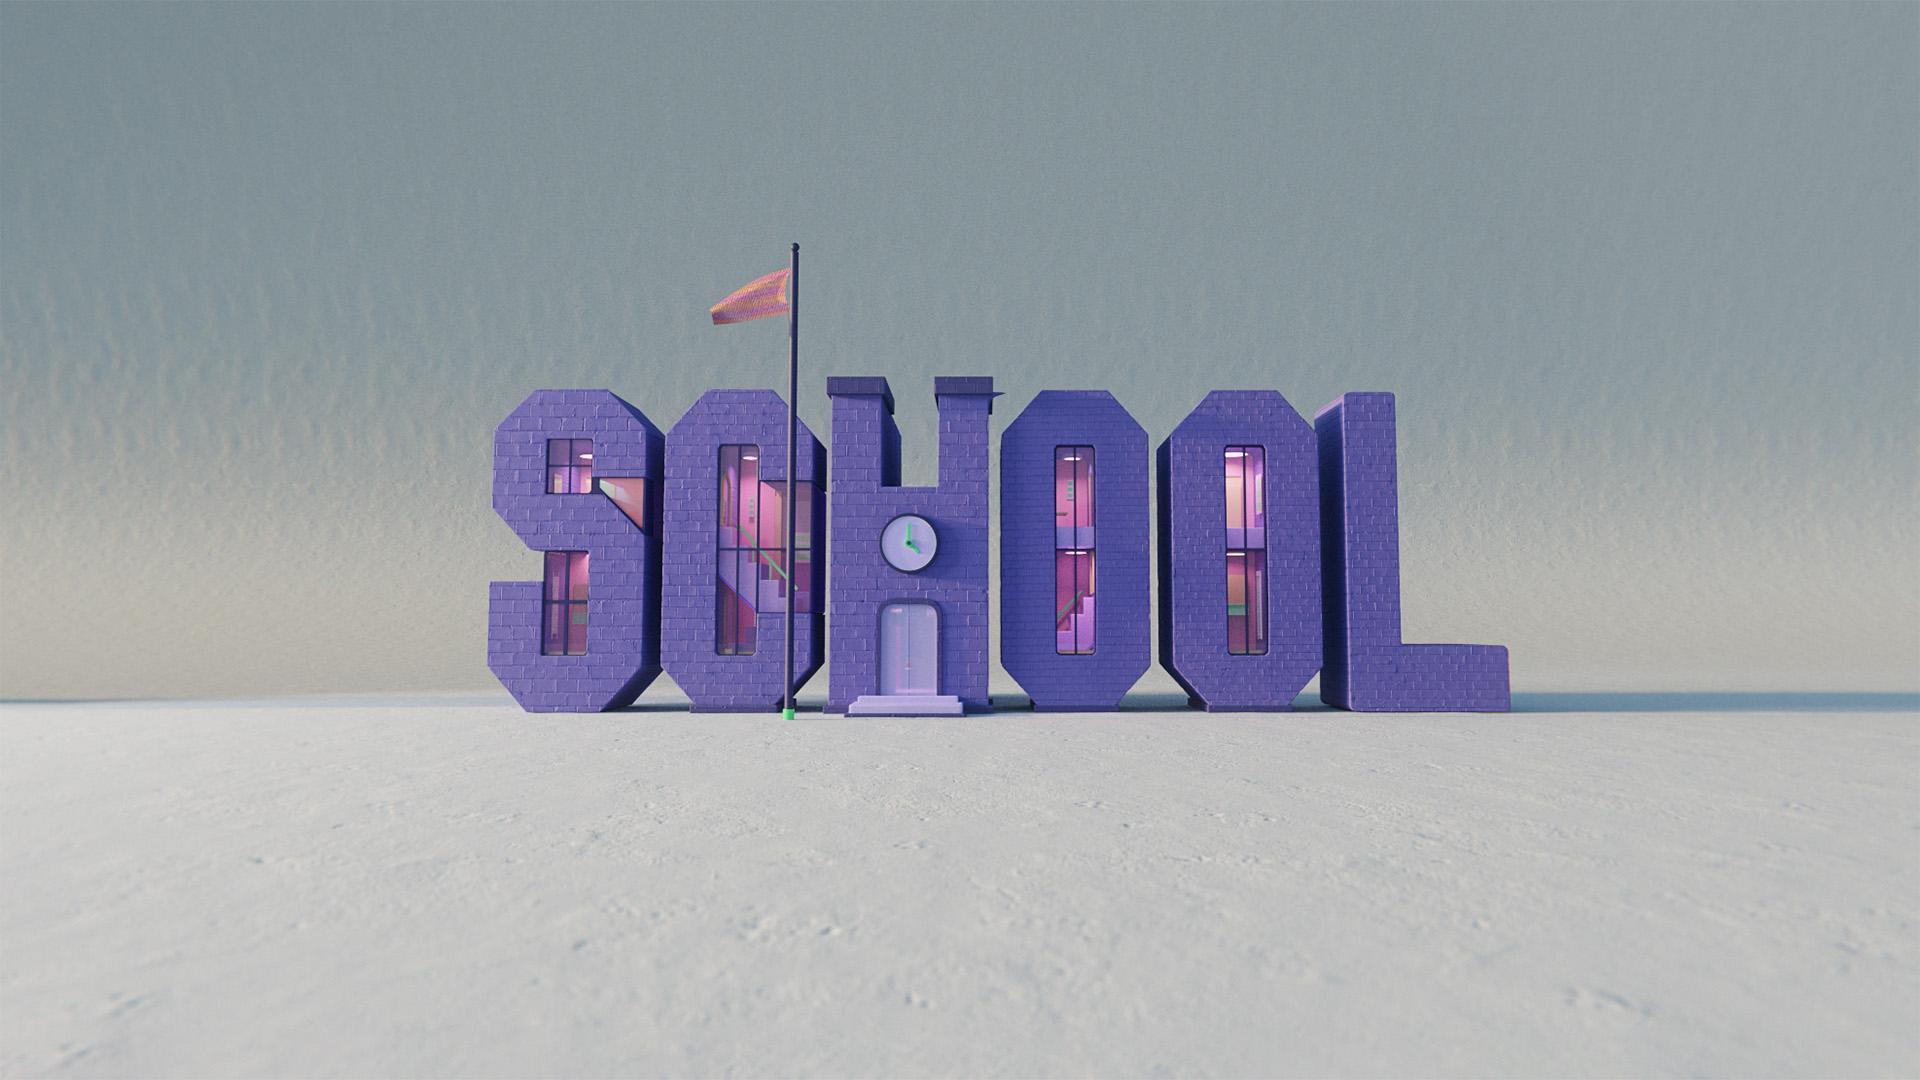 roofstudio_juni-learning_school-02-8